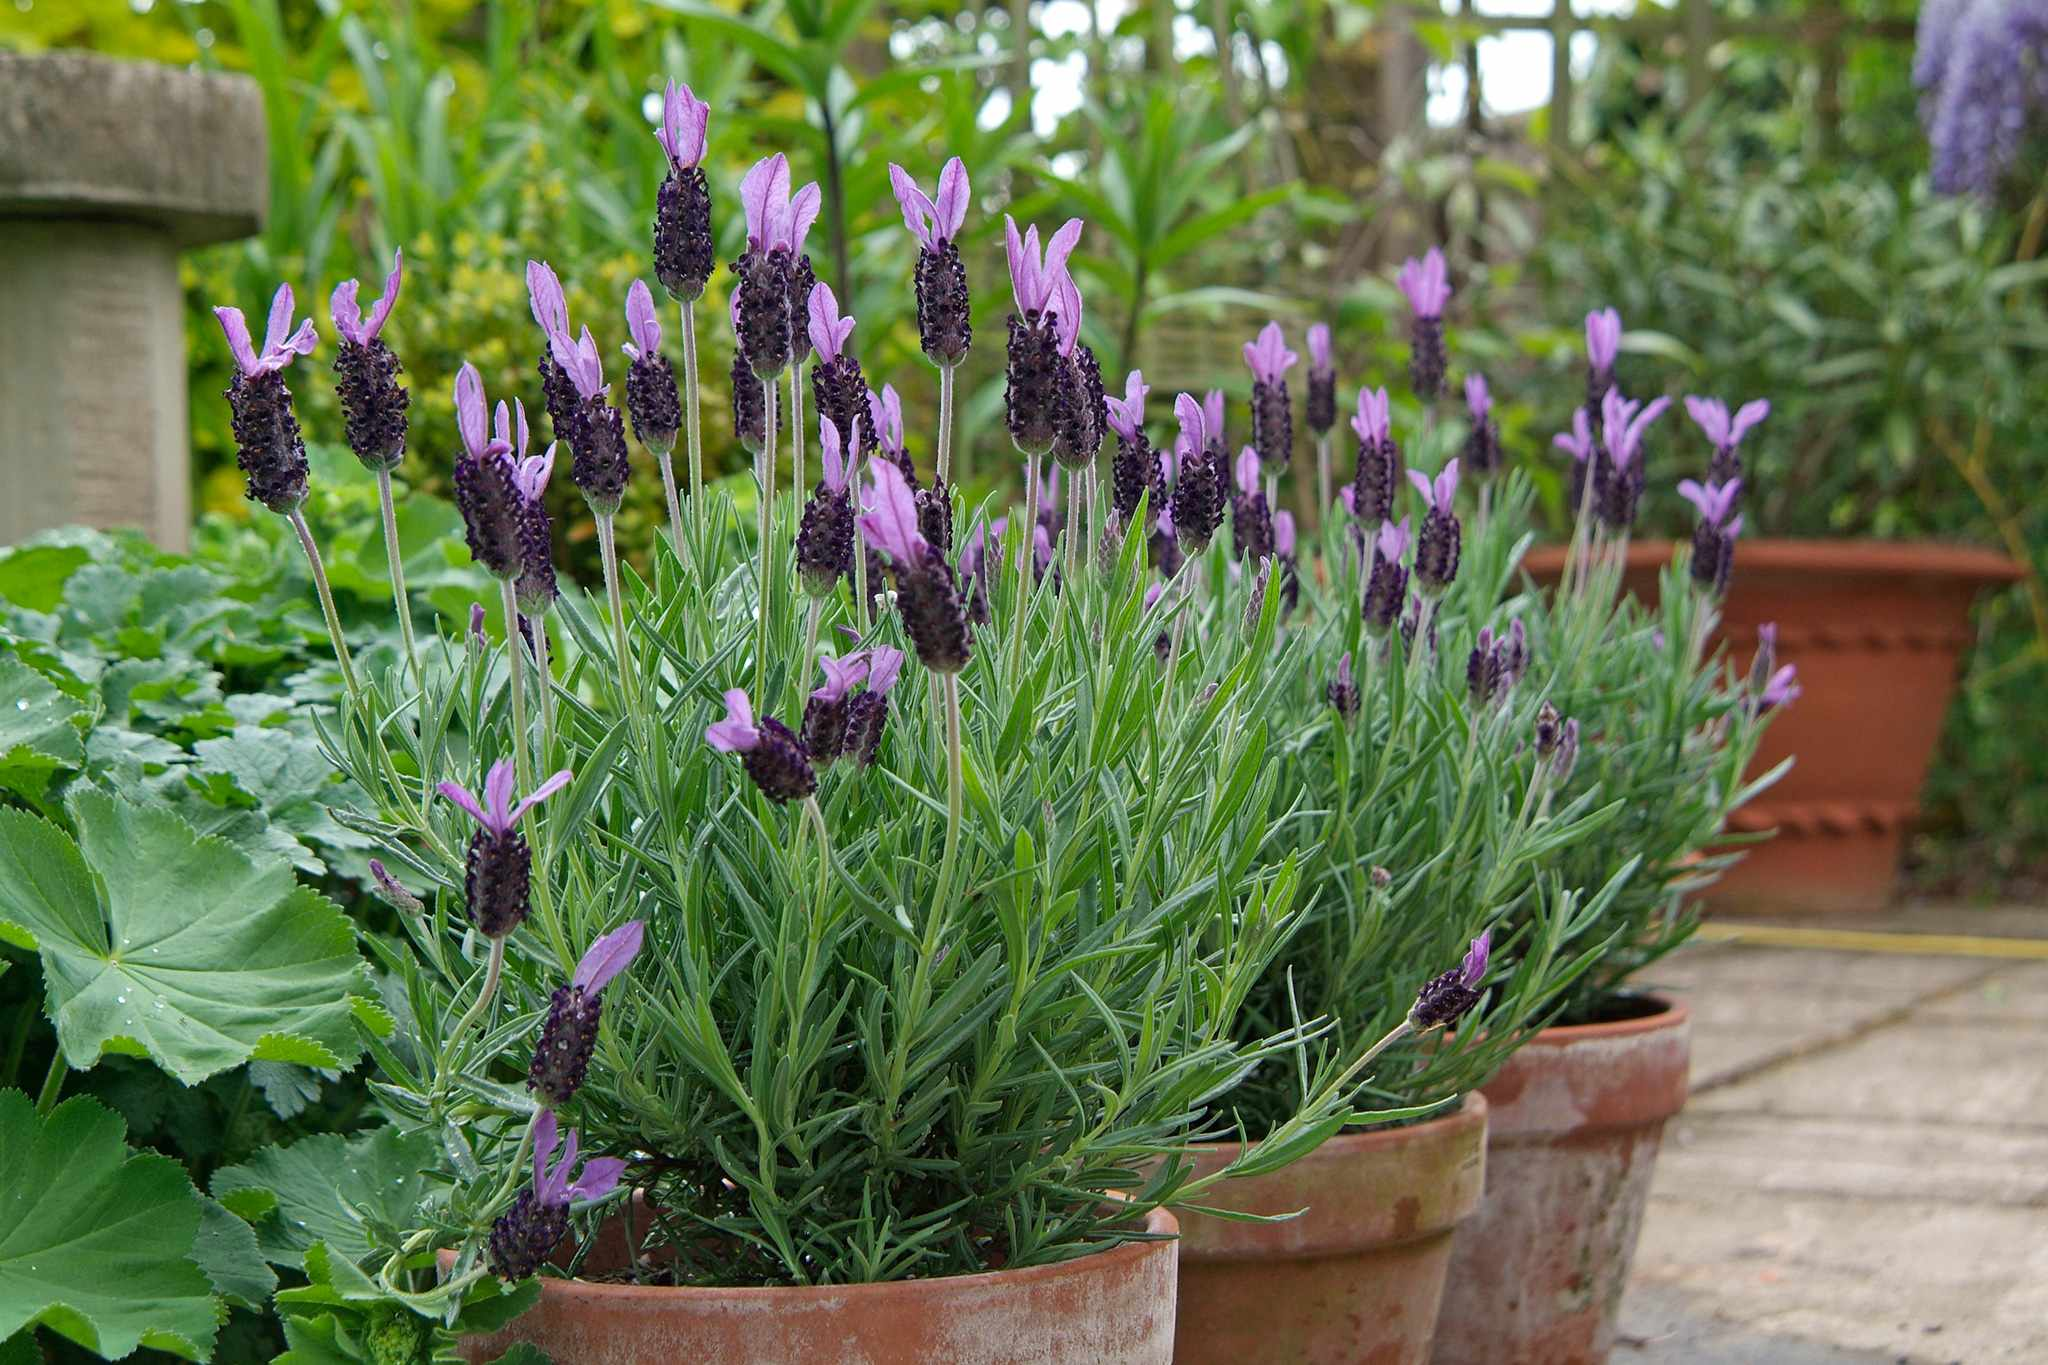 Lavender stoechas